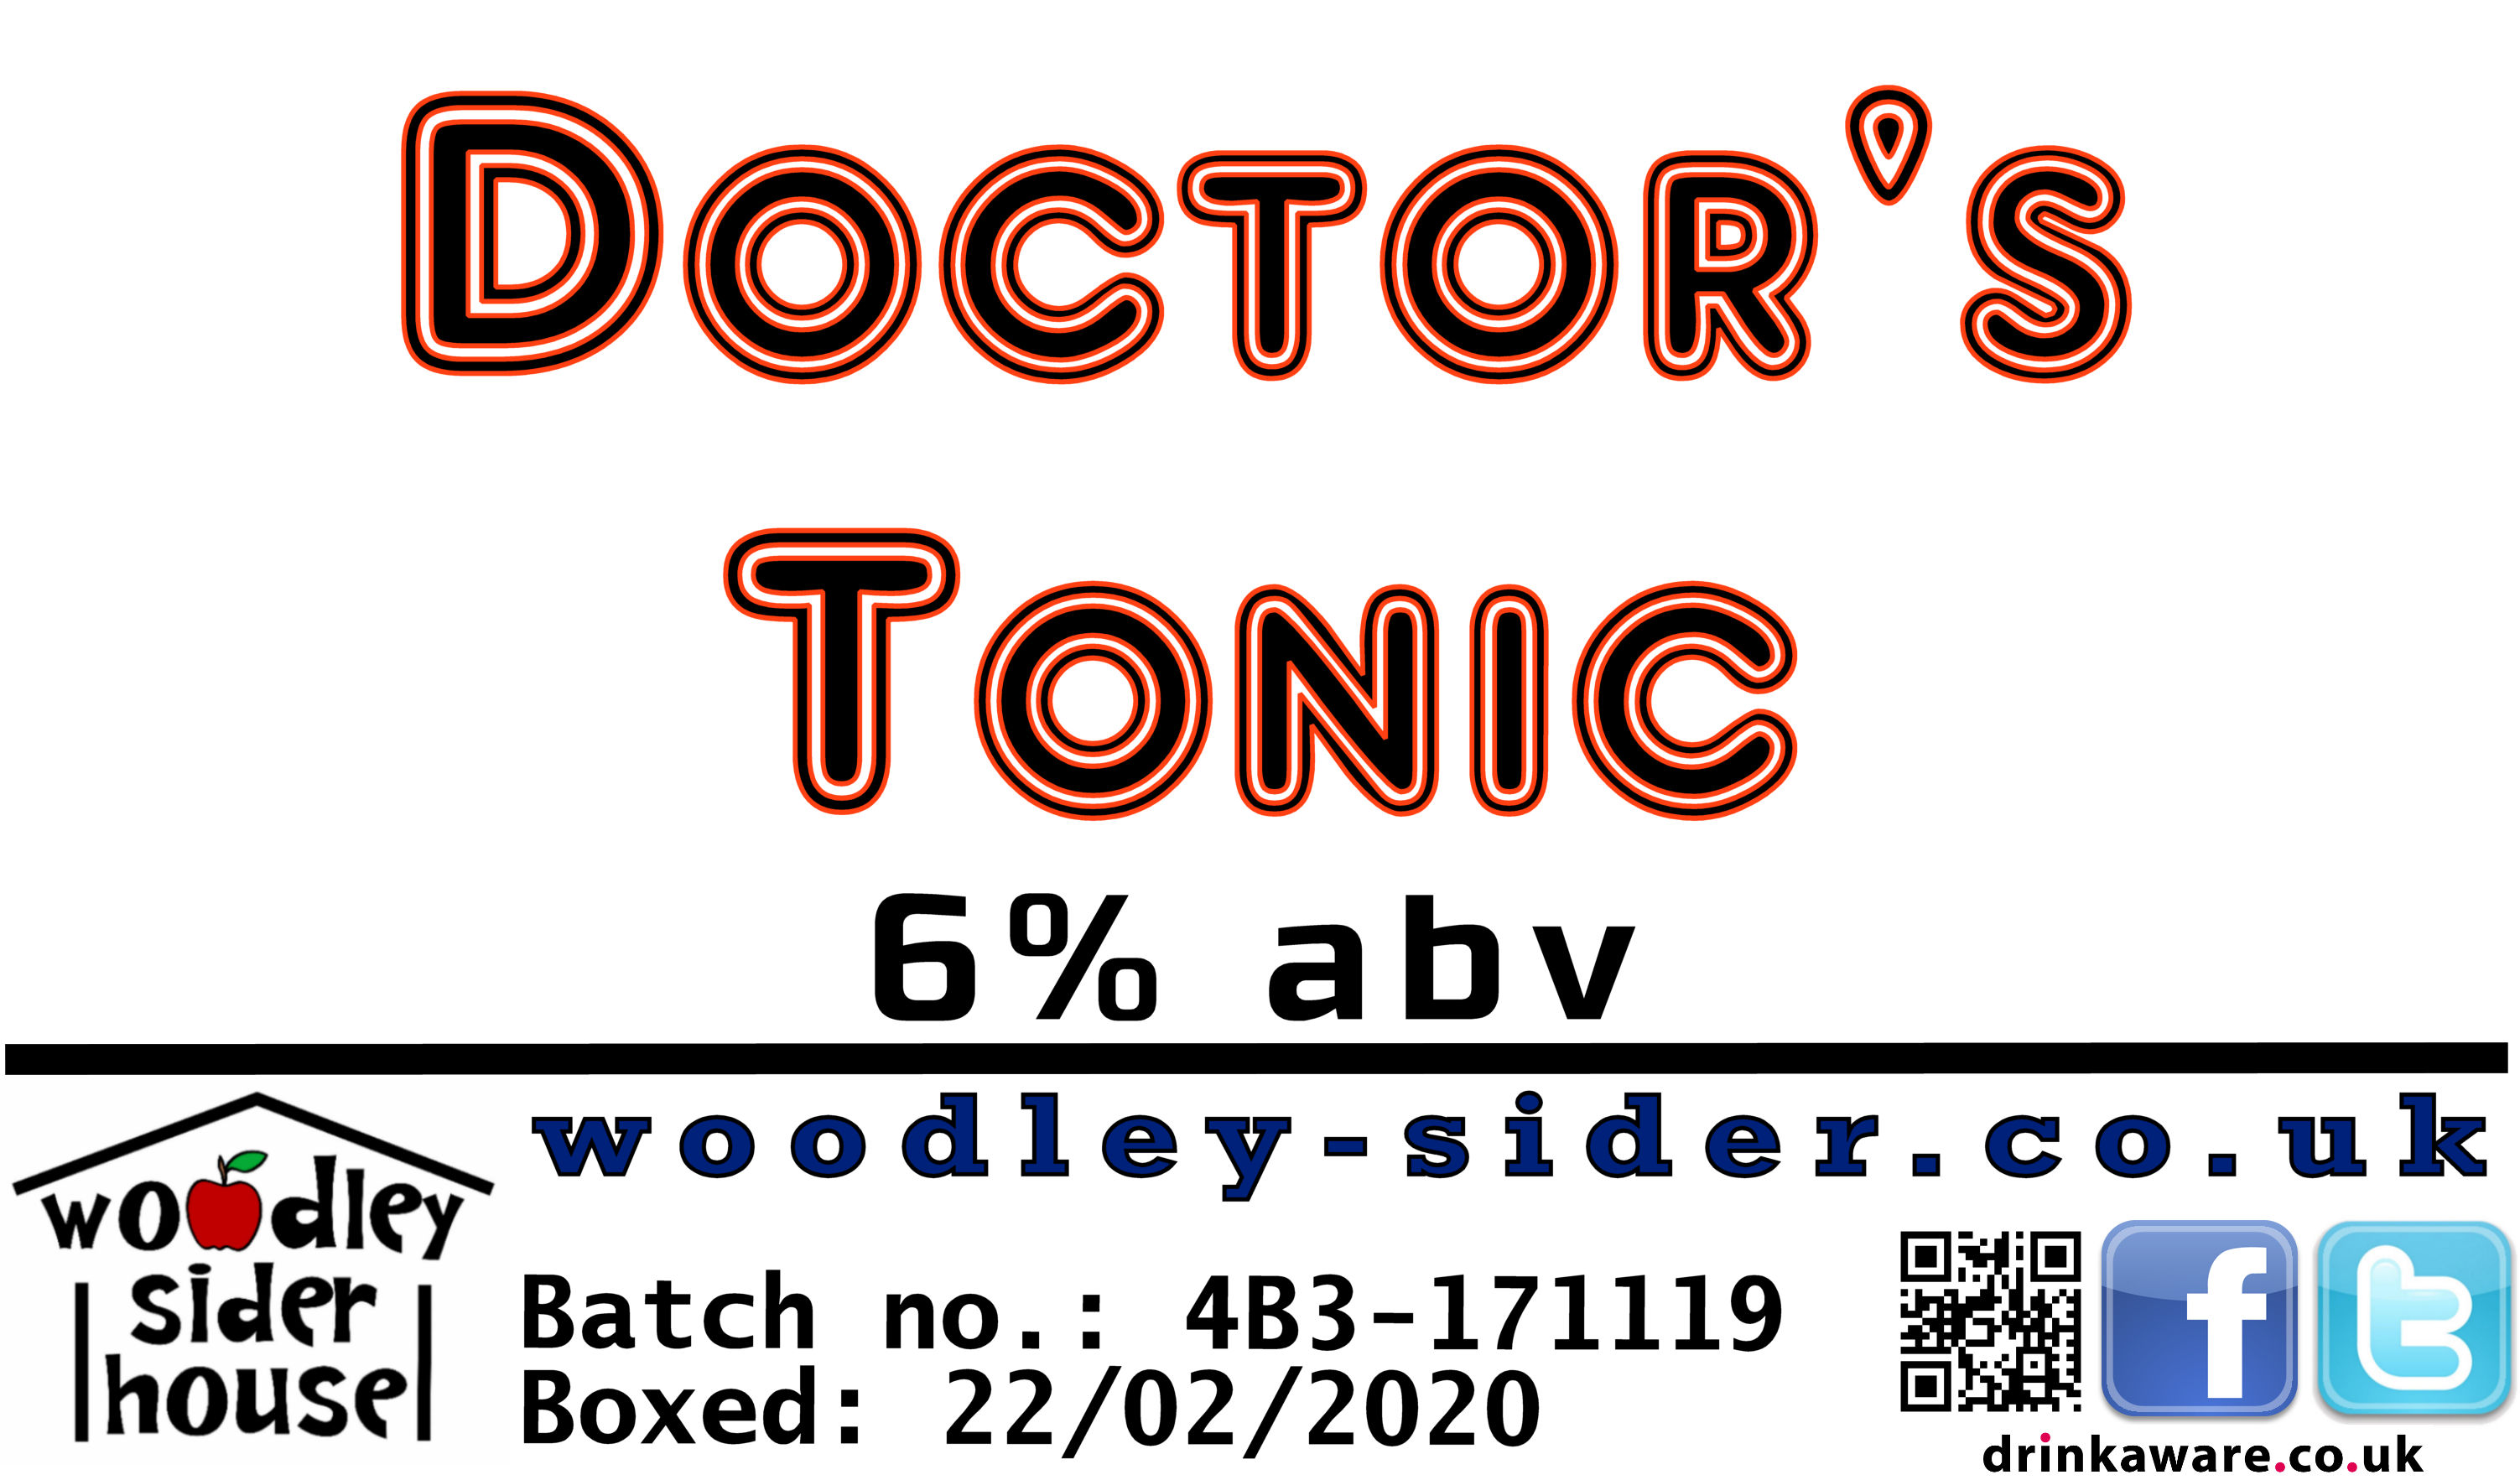 Doctor's Tonic